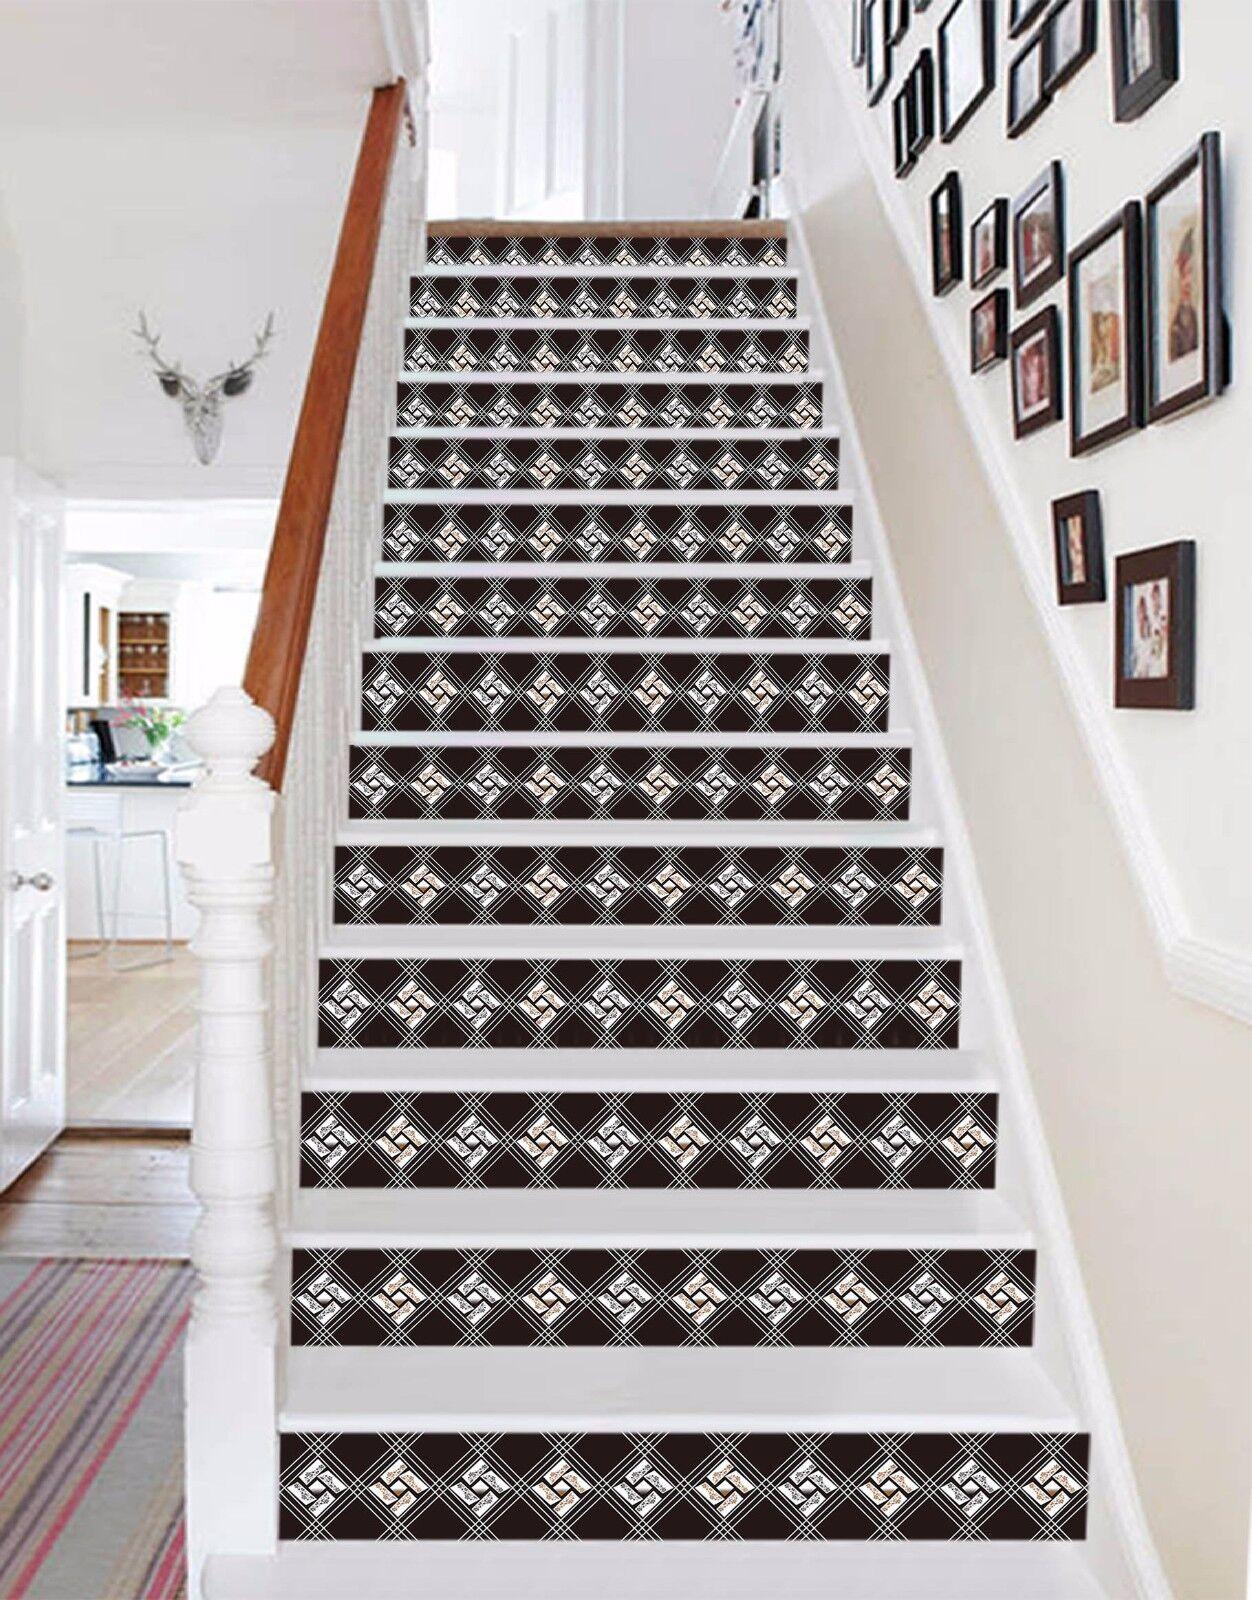 3D Grid 428 Stair Risers Decoration Photo Mural Vinyl Decal Wallpaper AU Lemon